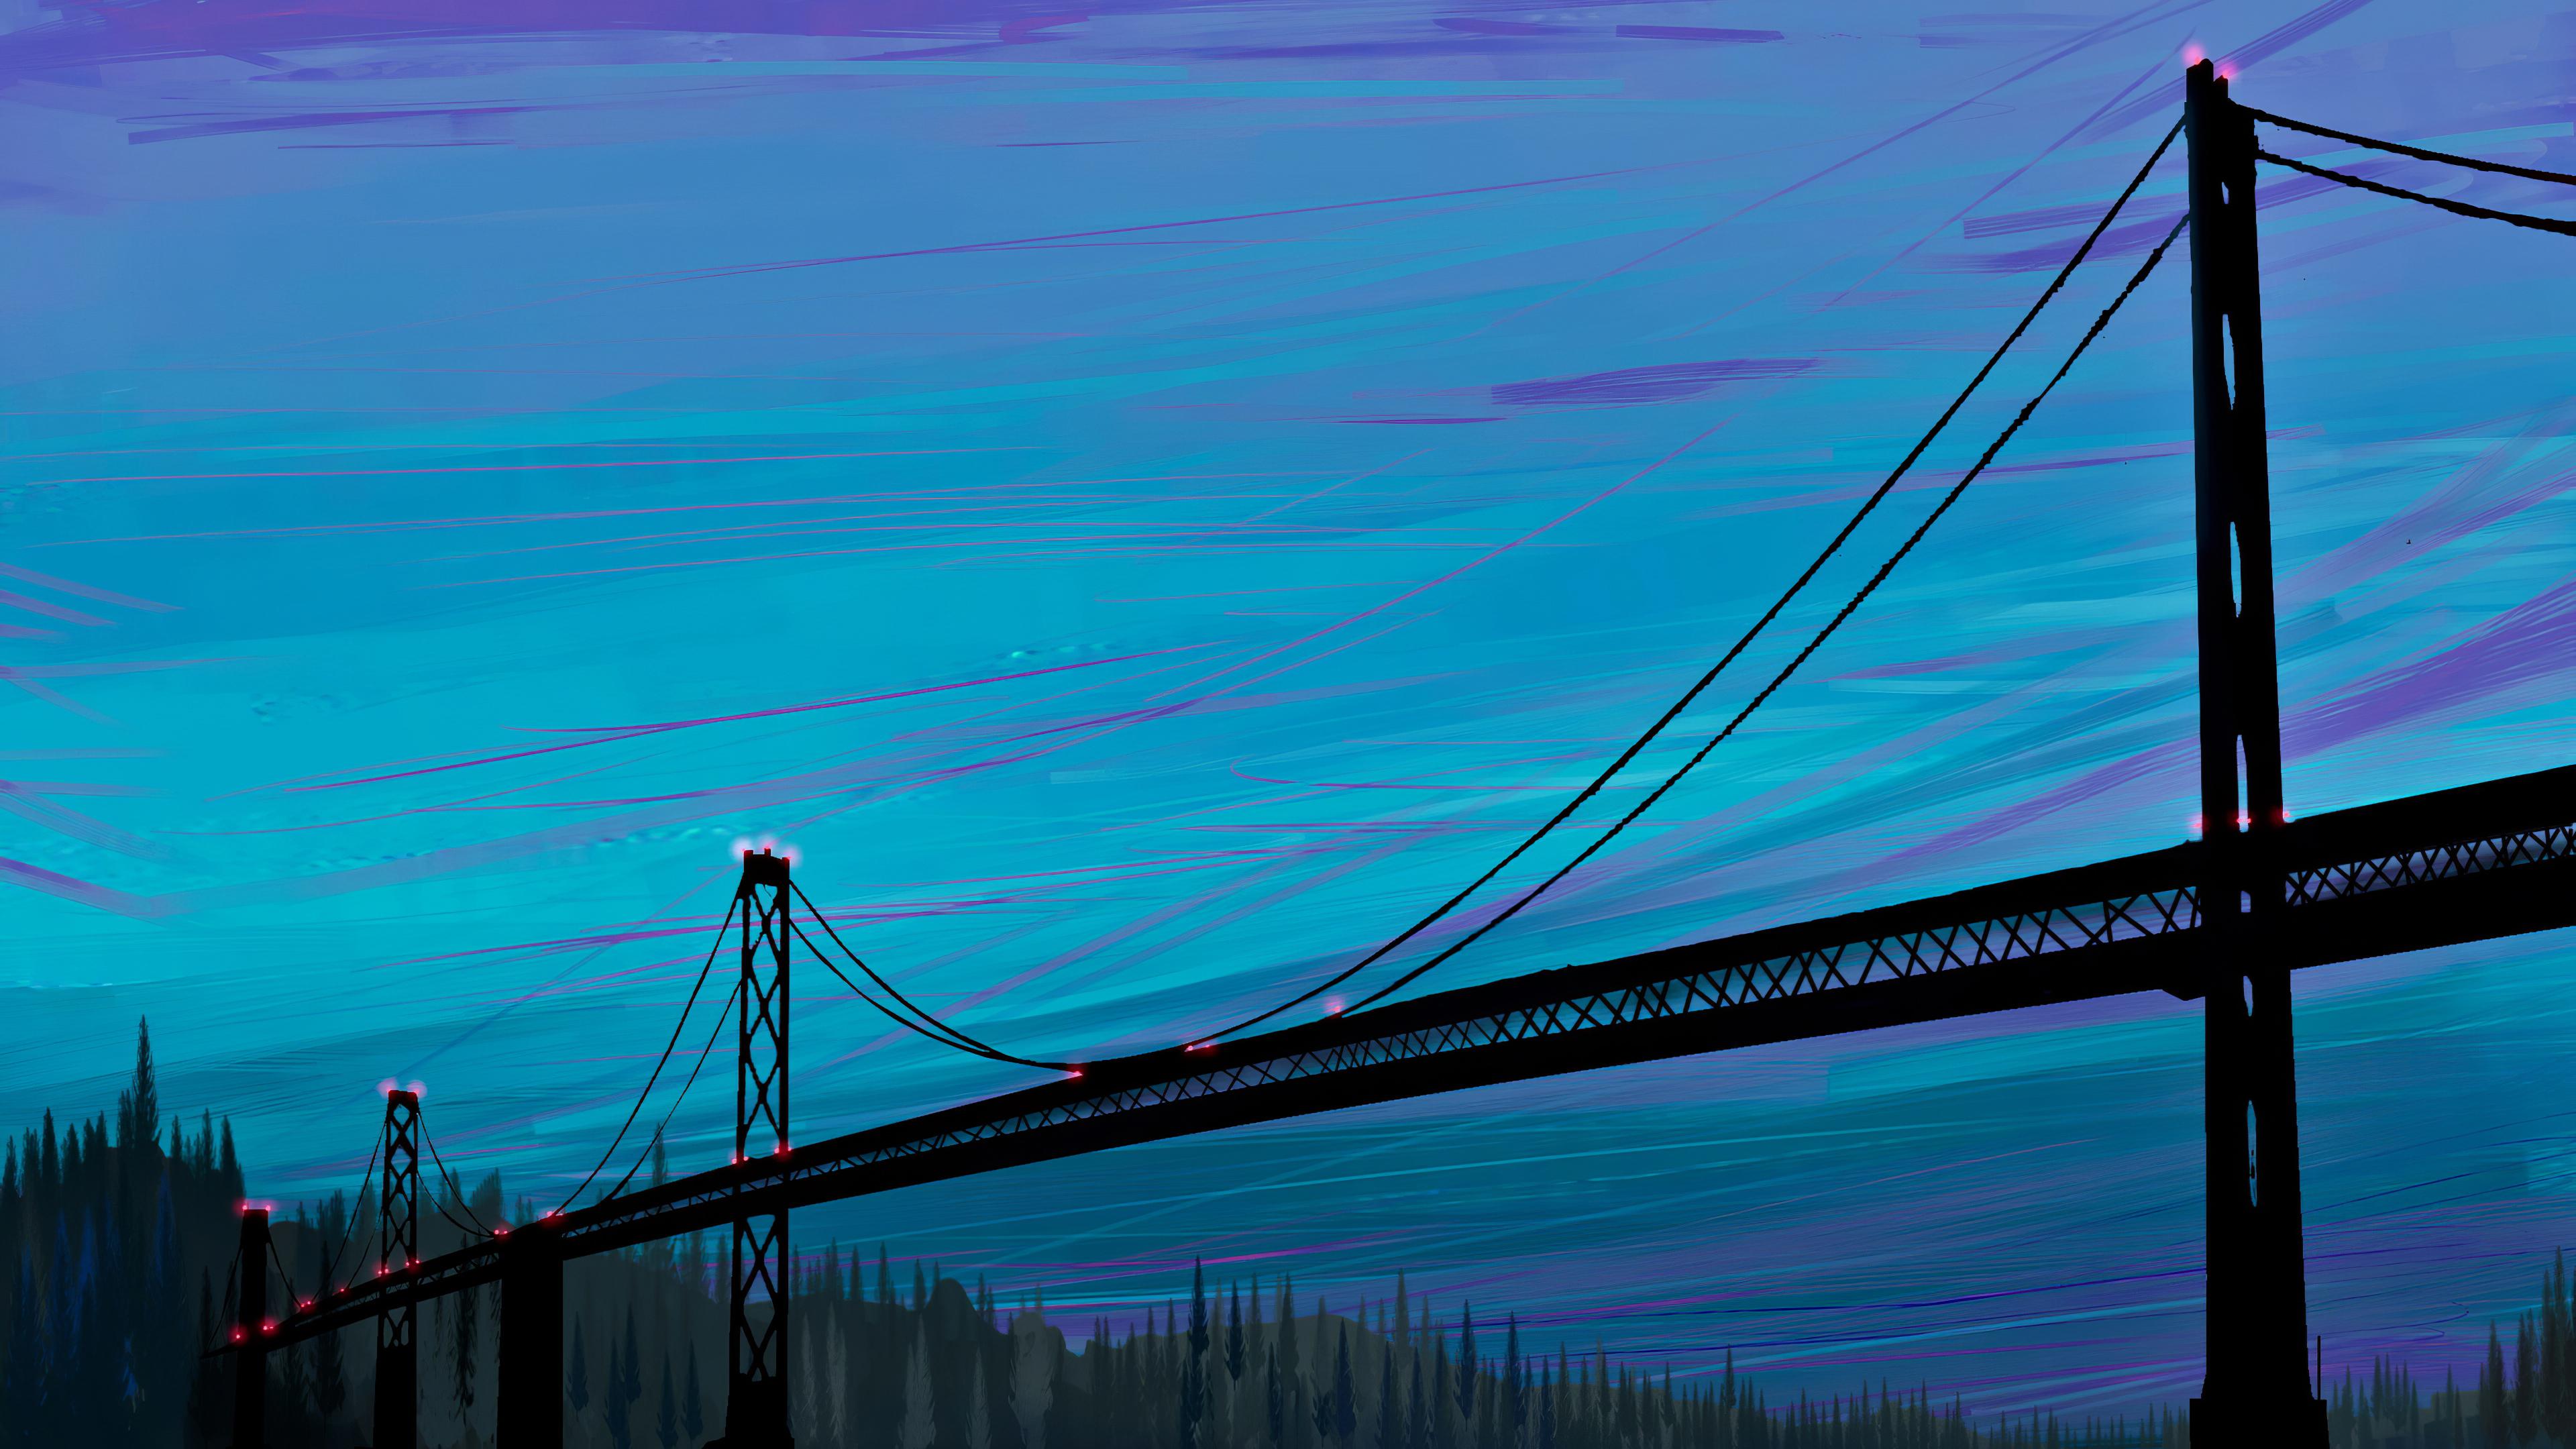 sea bridge digital art 1574940856 - Sea Bridge Digital Art -